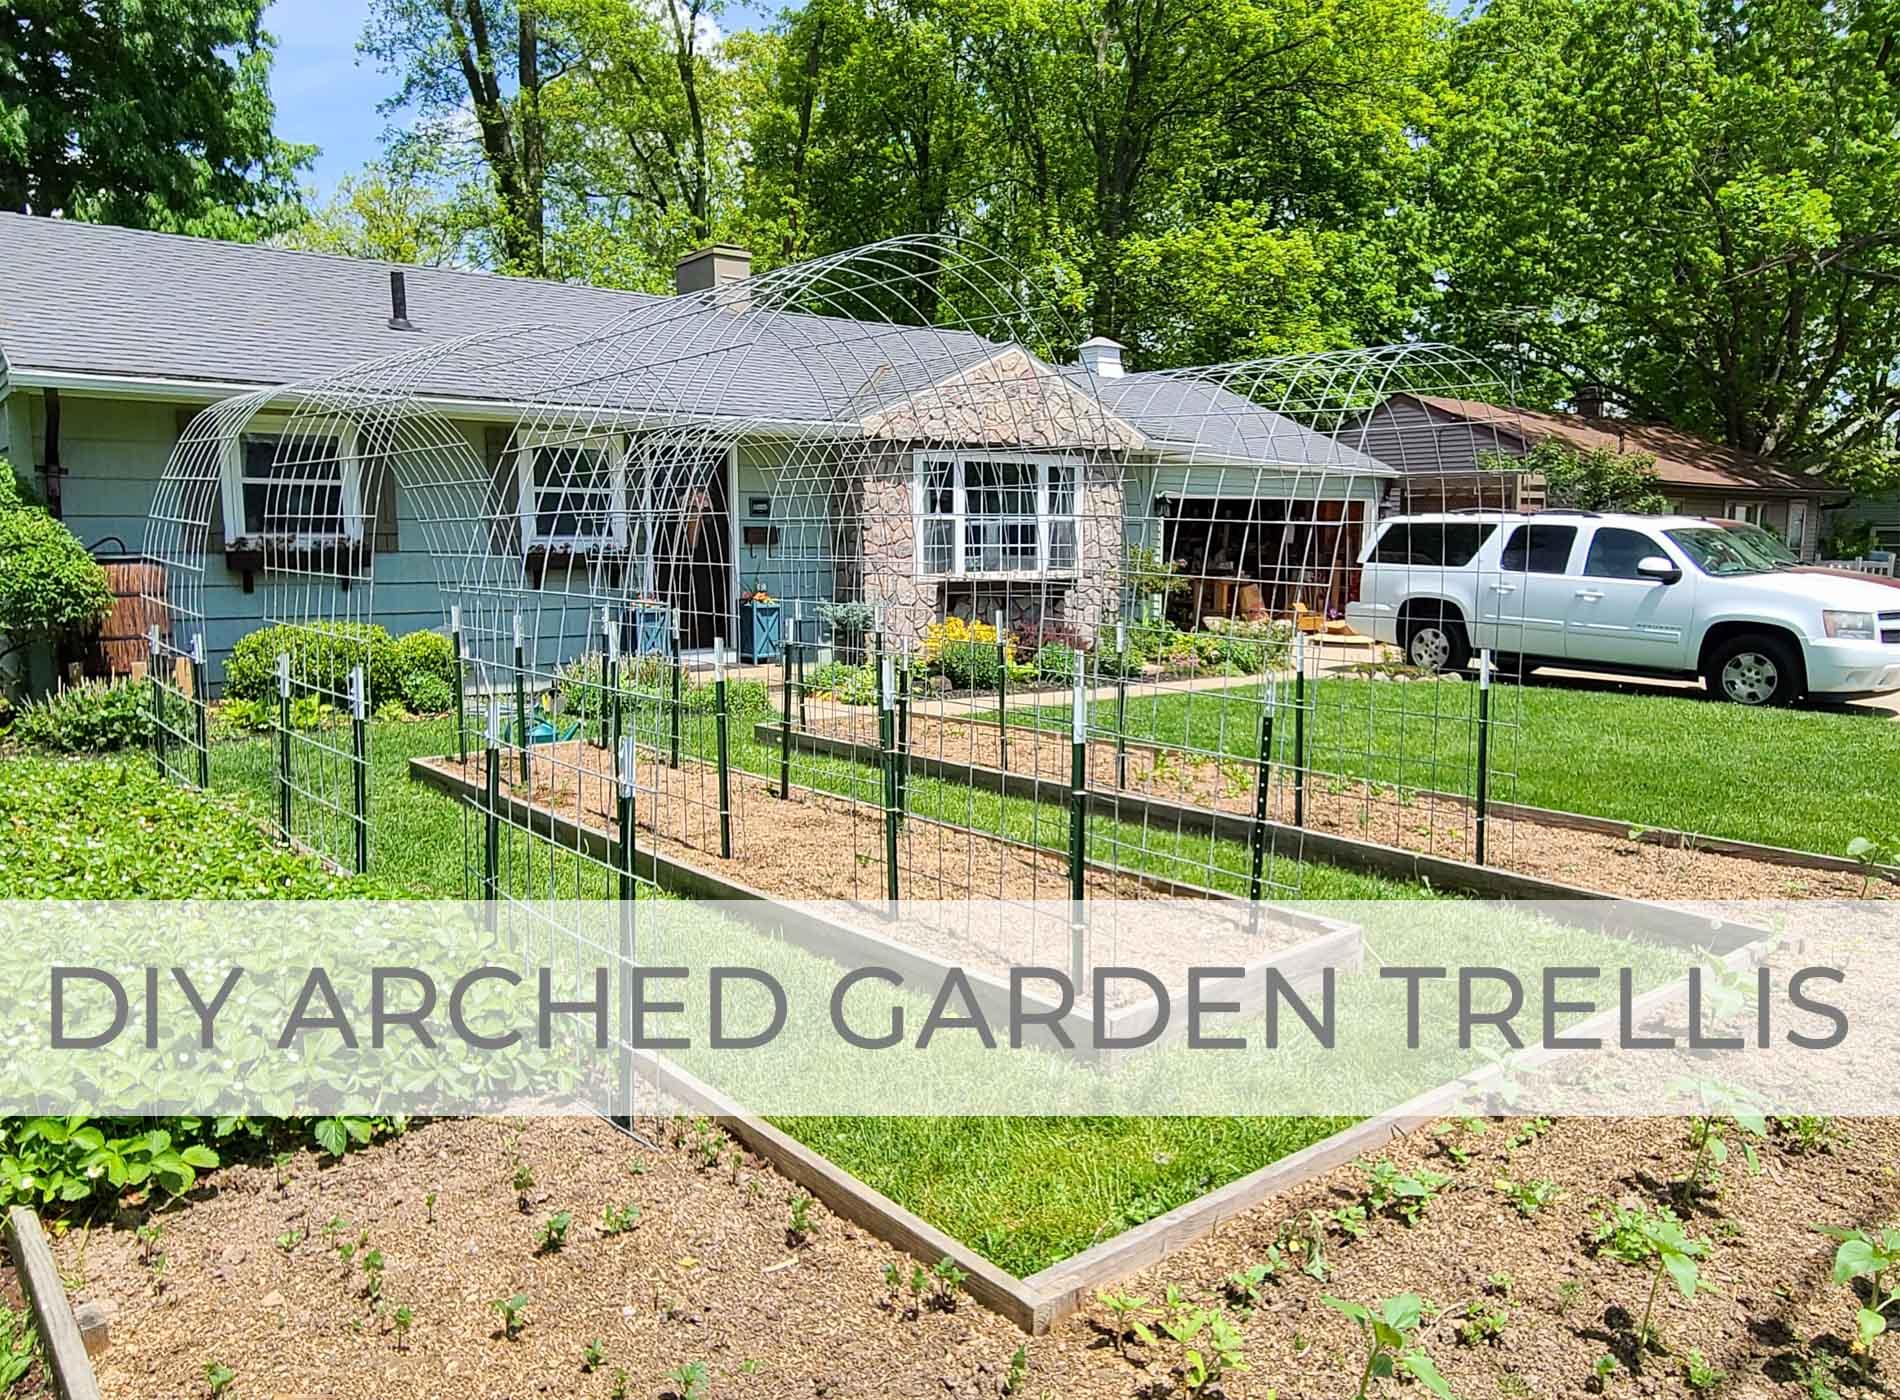 DIY Arched Garden Trellis by Prodigal Pieces | prodigalpieces.com